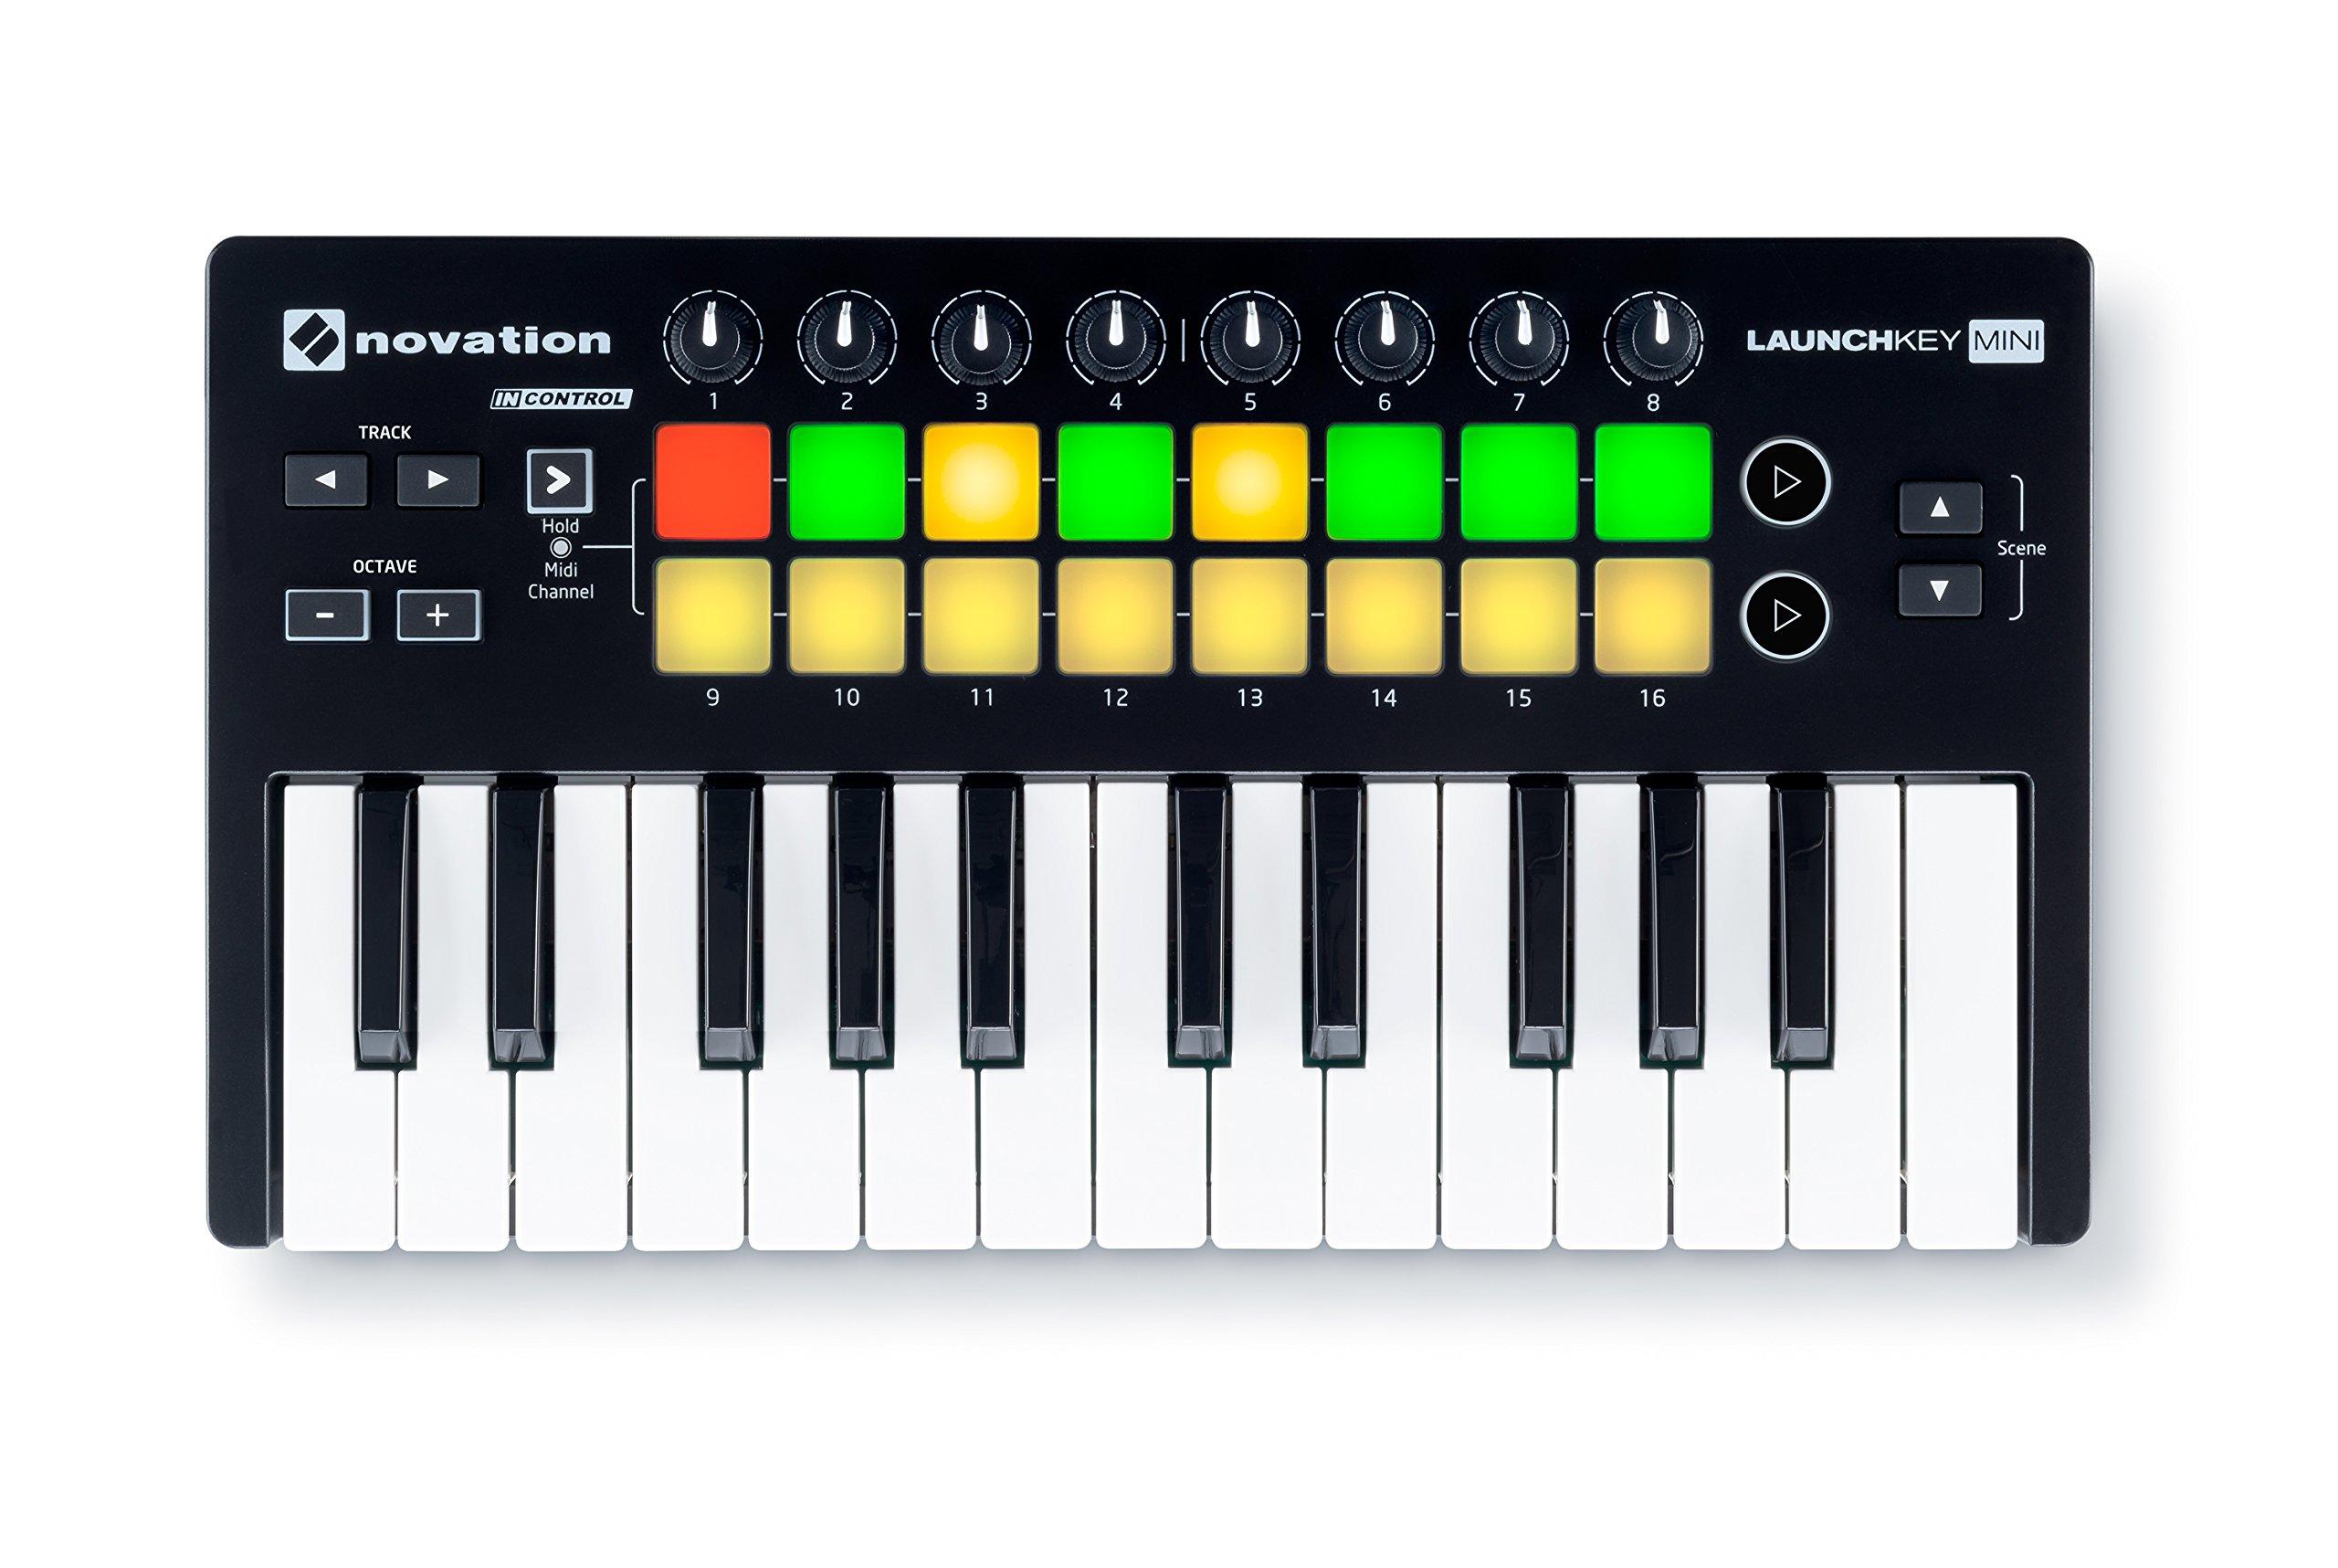 Novation Launchkey Mini 25-Note USB Keyboard Controller, MK2 Version by Novation